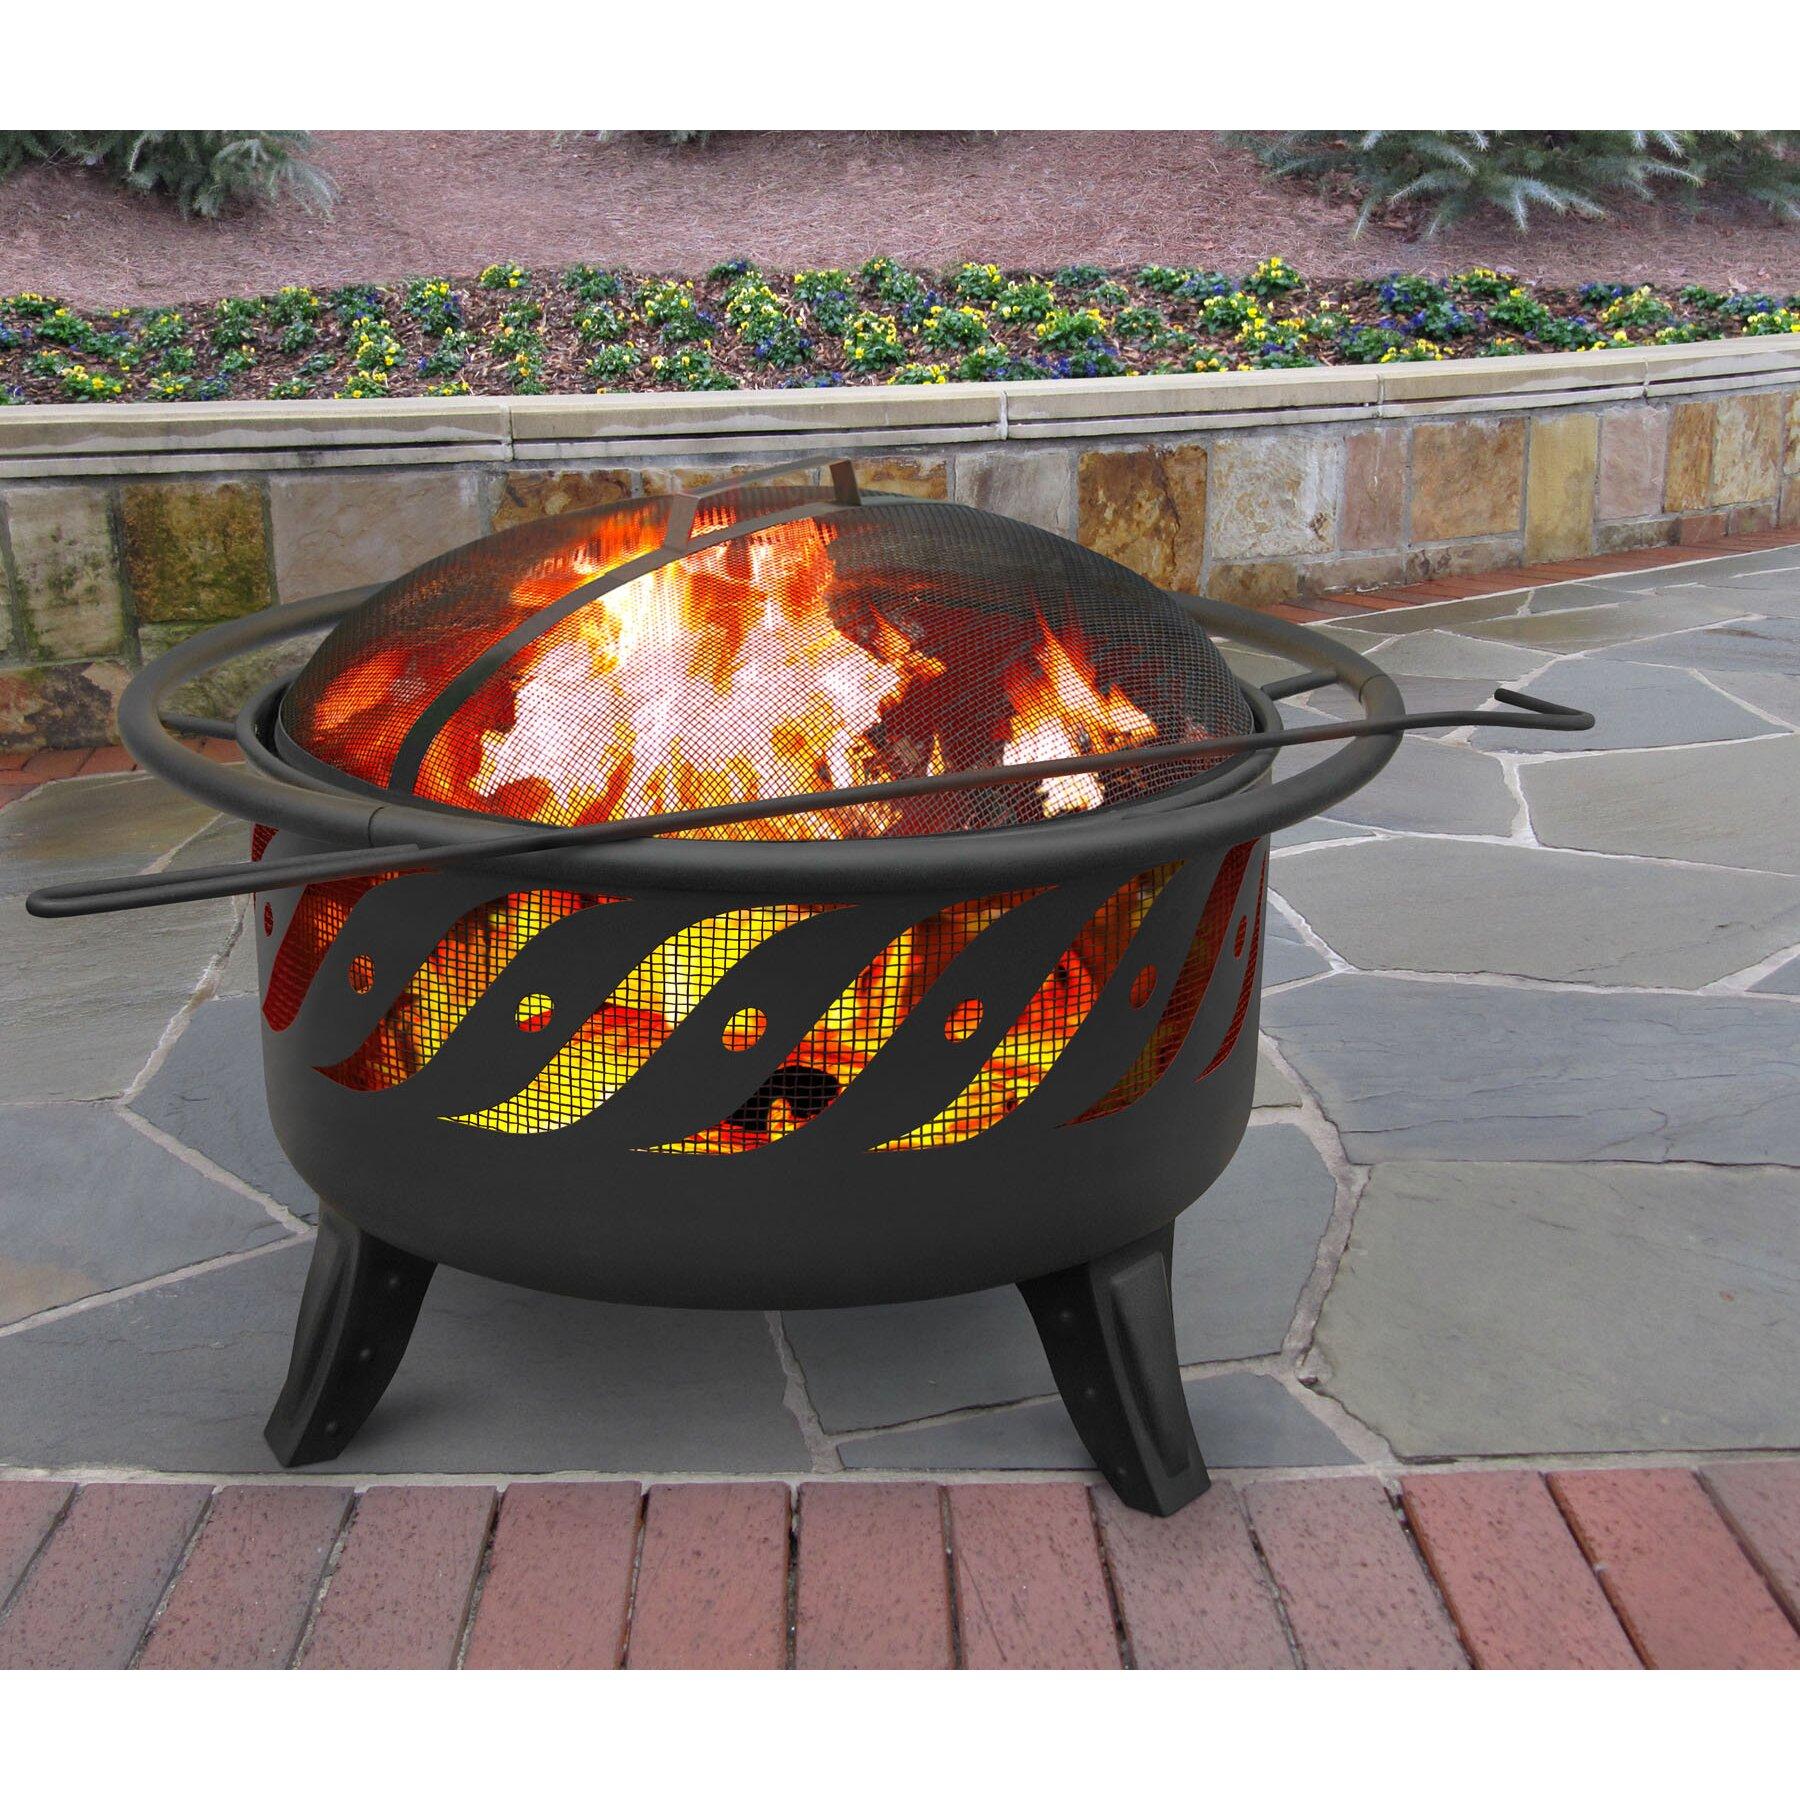 Backyard Patios With Fire Pits: Landmann Patio Lights Wood Burning Fire Pit & Reviews